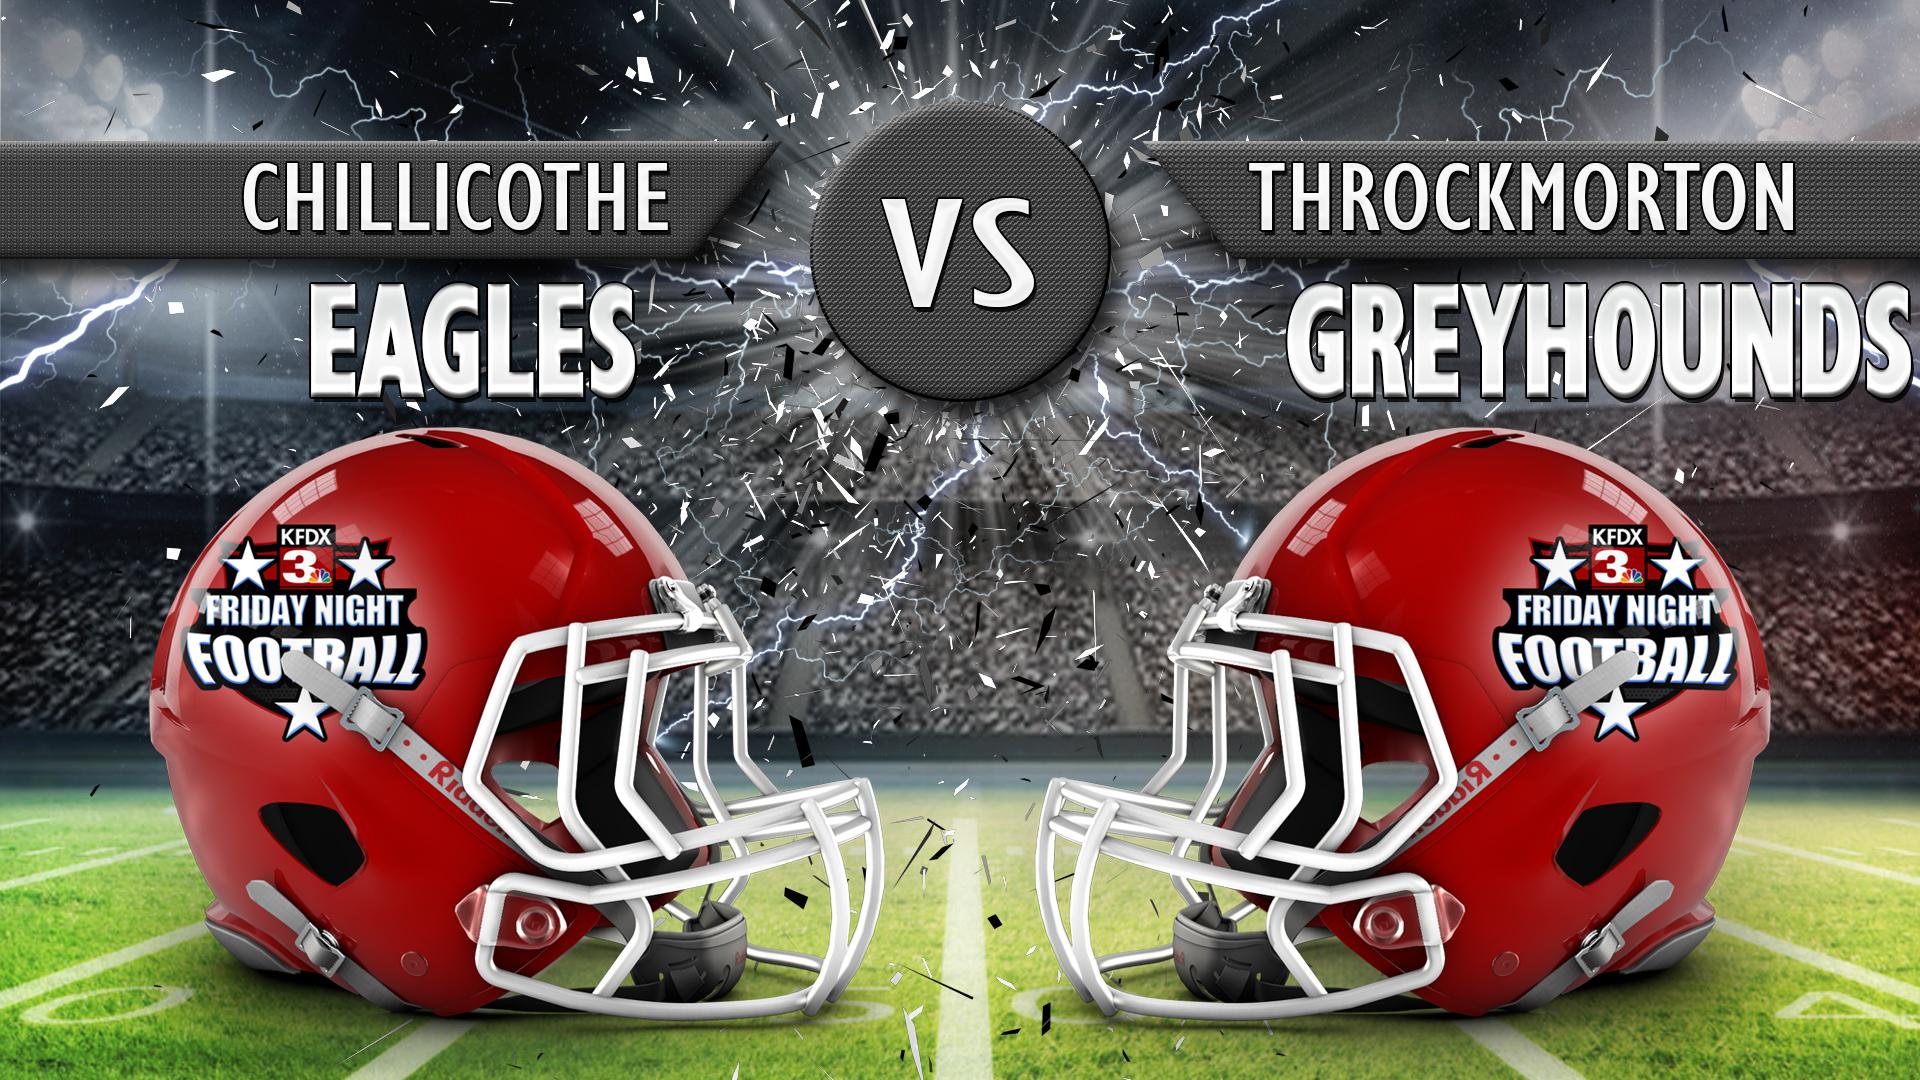 CHILLICOTHE VS THROCKMORTON_1538144771292.jpg.jpg